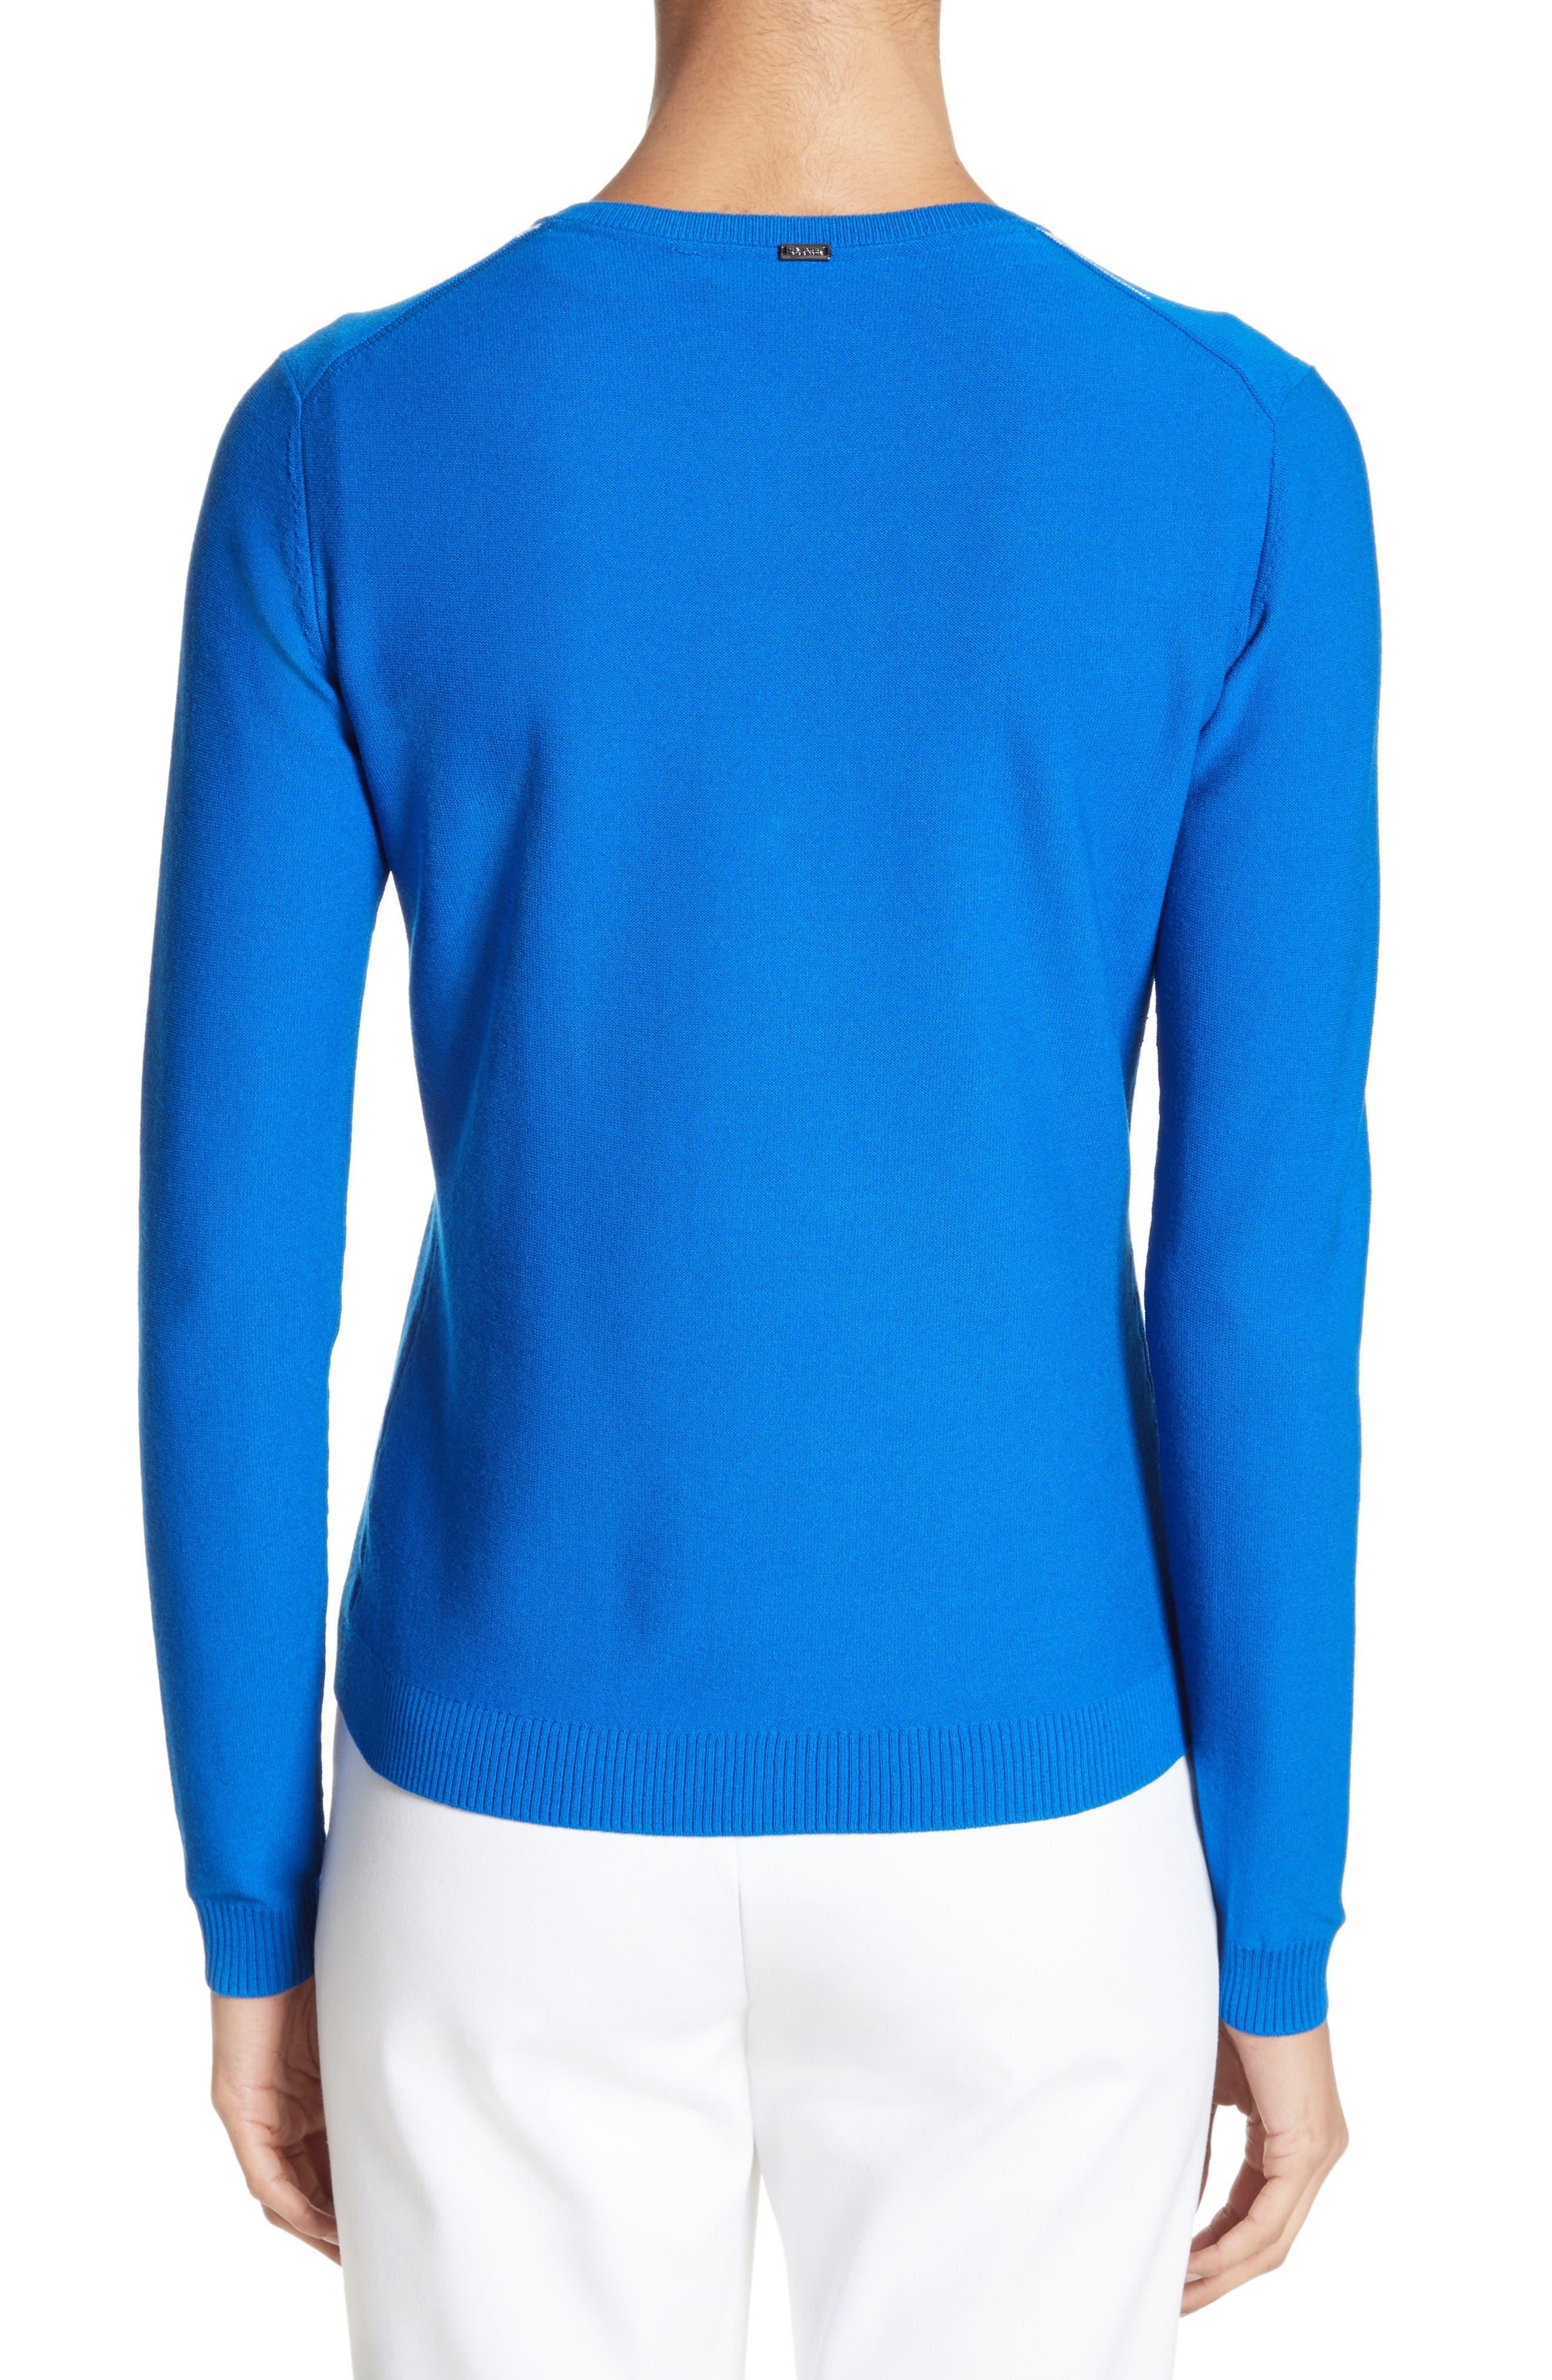 Stripe Intarsia Knit Cardigan,                             Alternate thumbnail 3, color,                             Jaya Blue/ Bianco